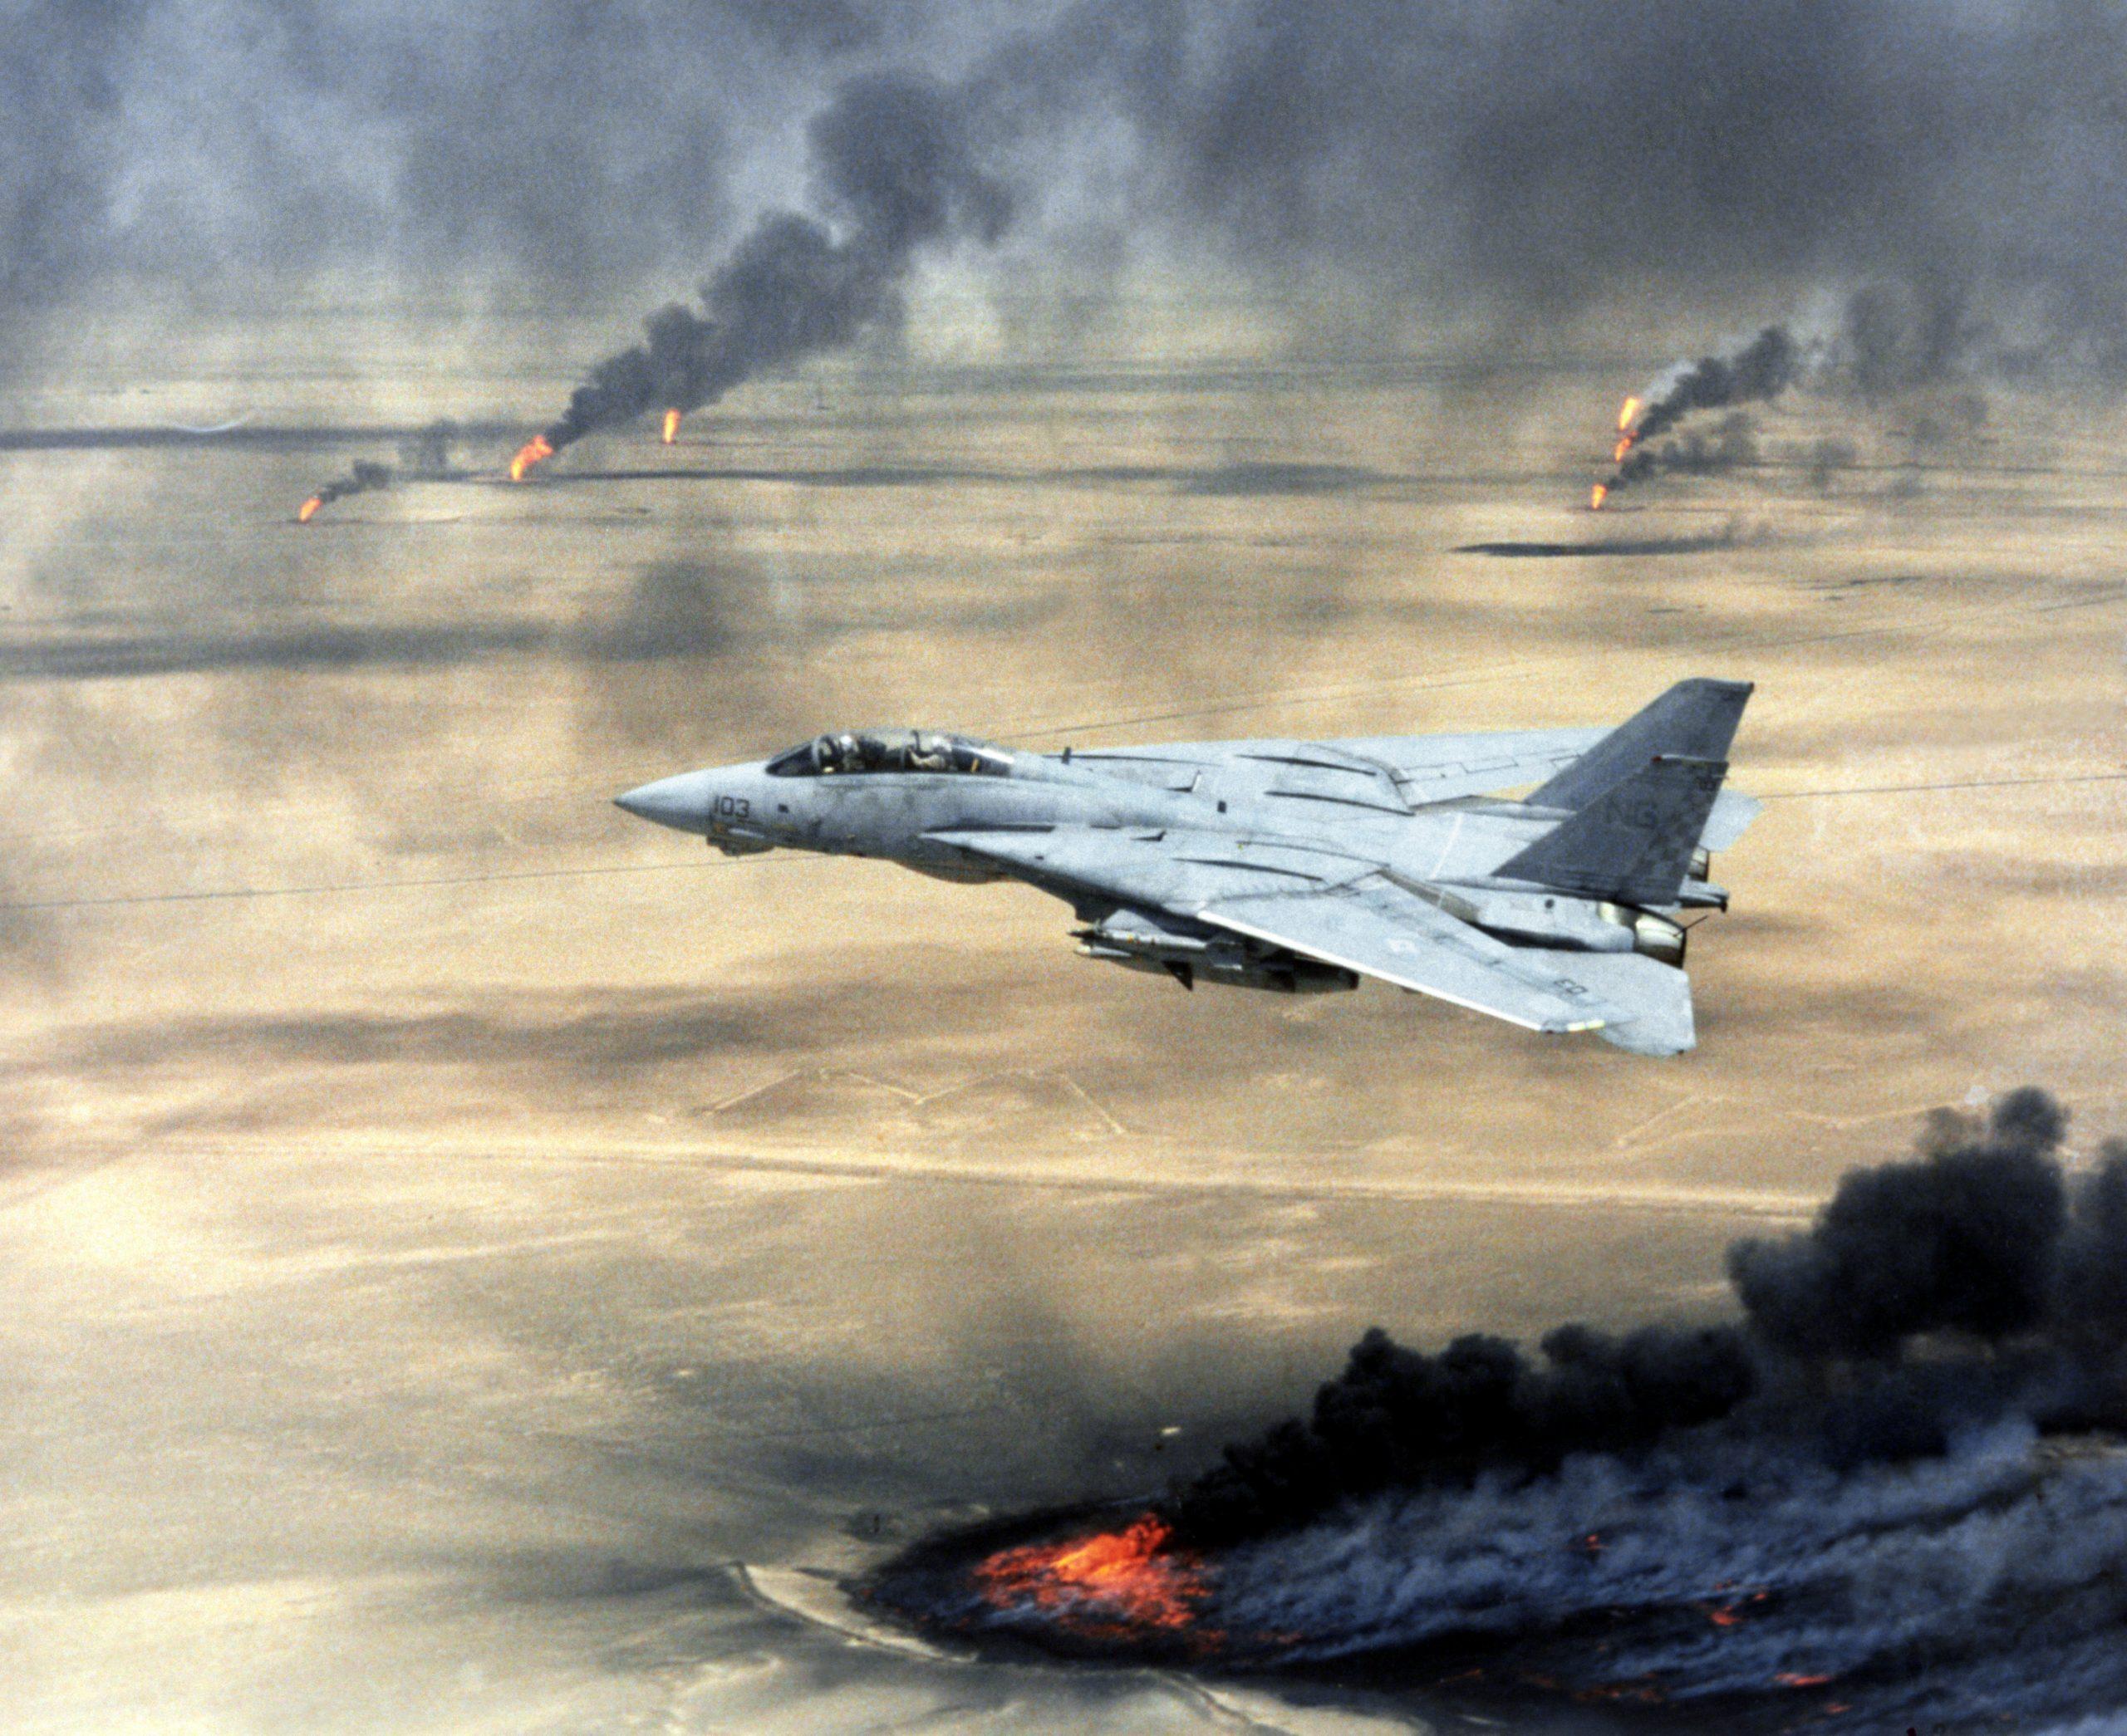 Operation Desert Storm Us Air Power On Full Display